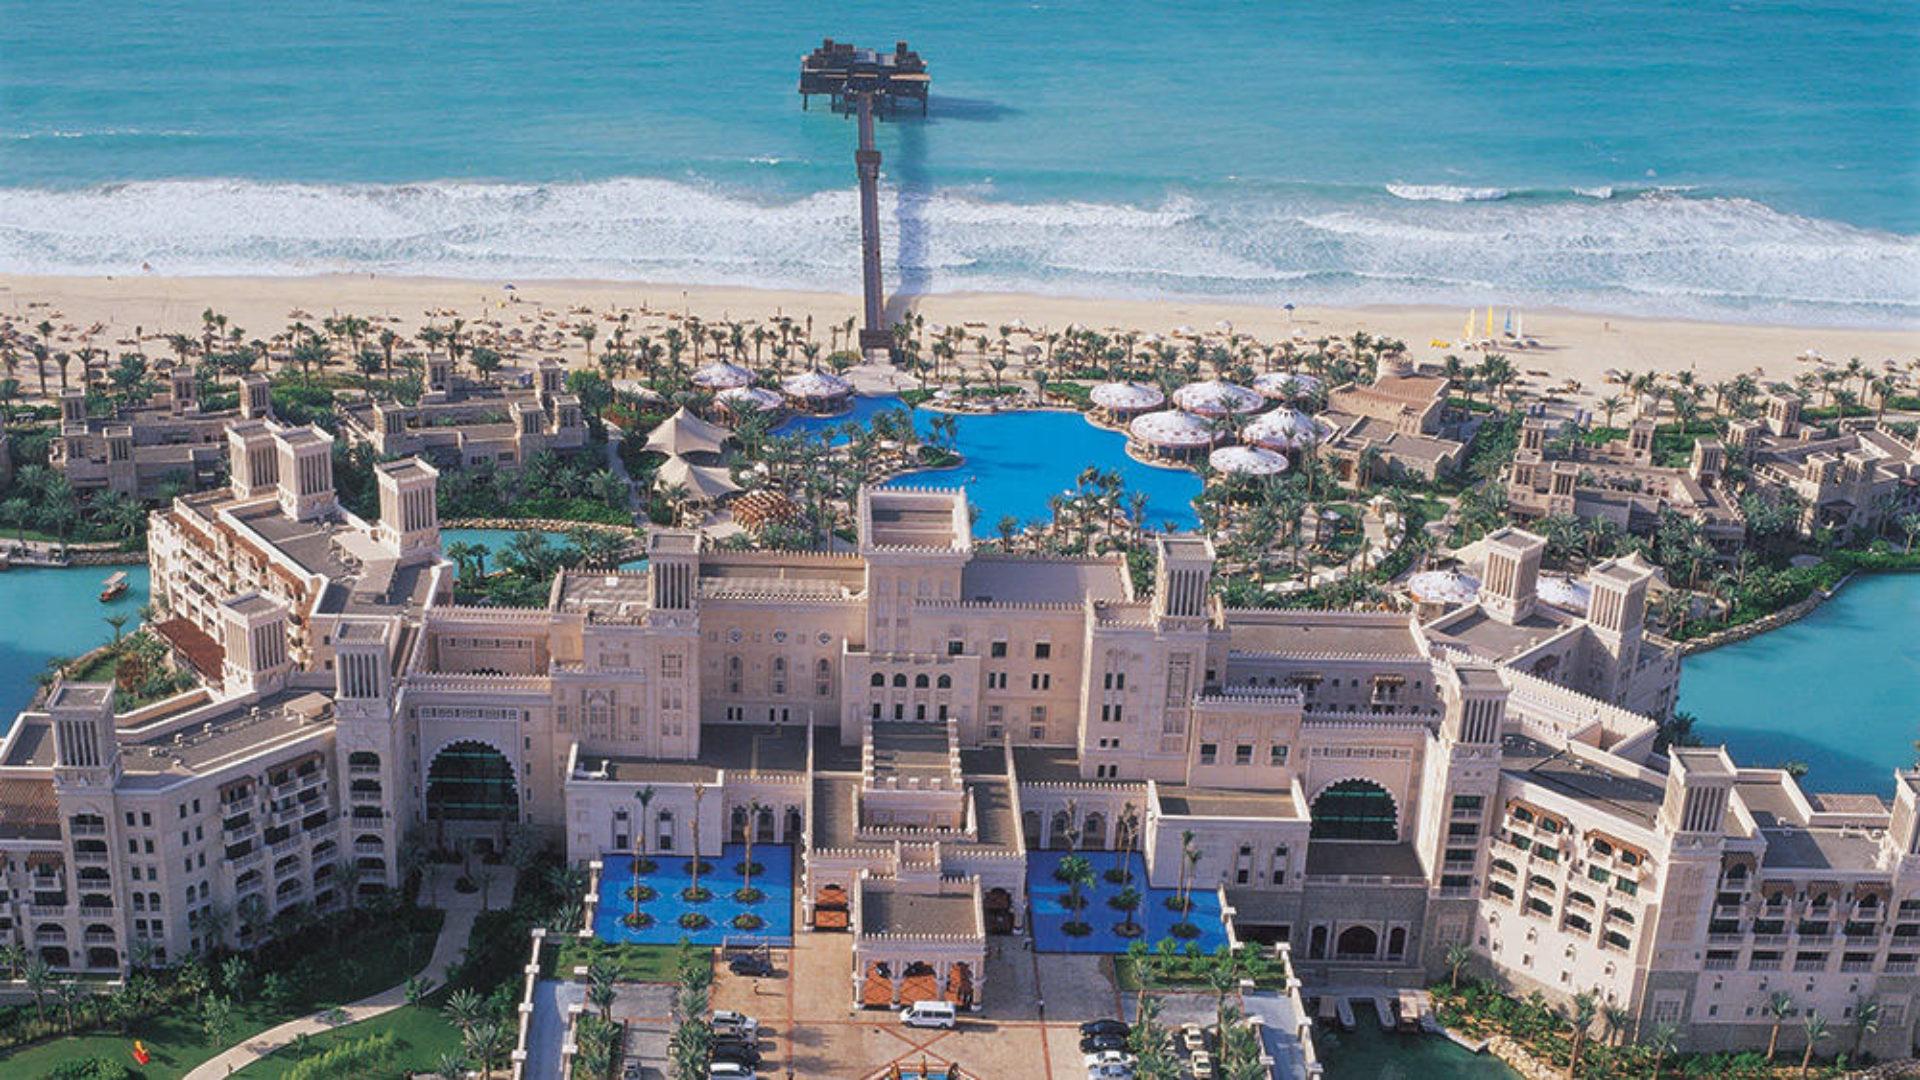 Aerial view of Madinat Jumeirah